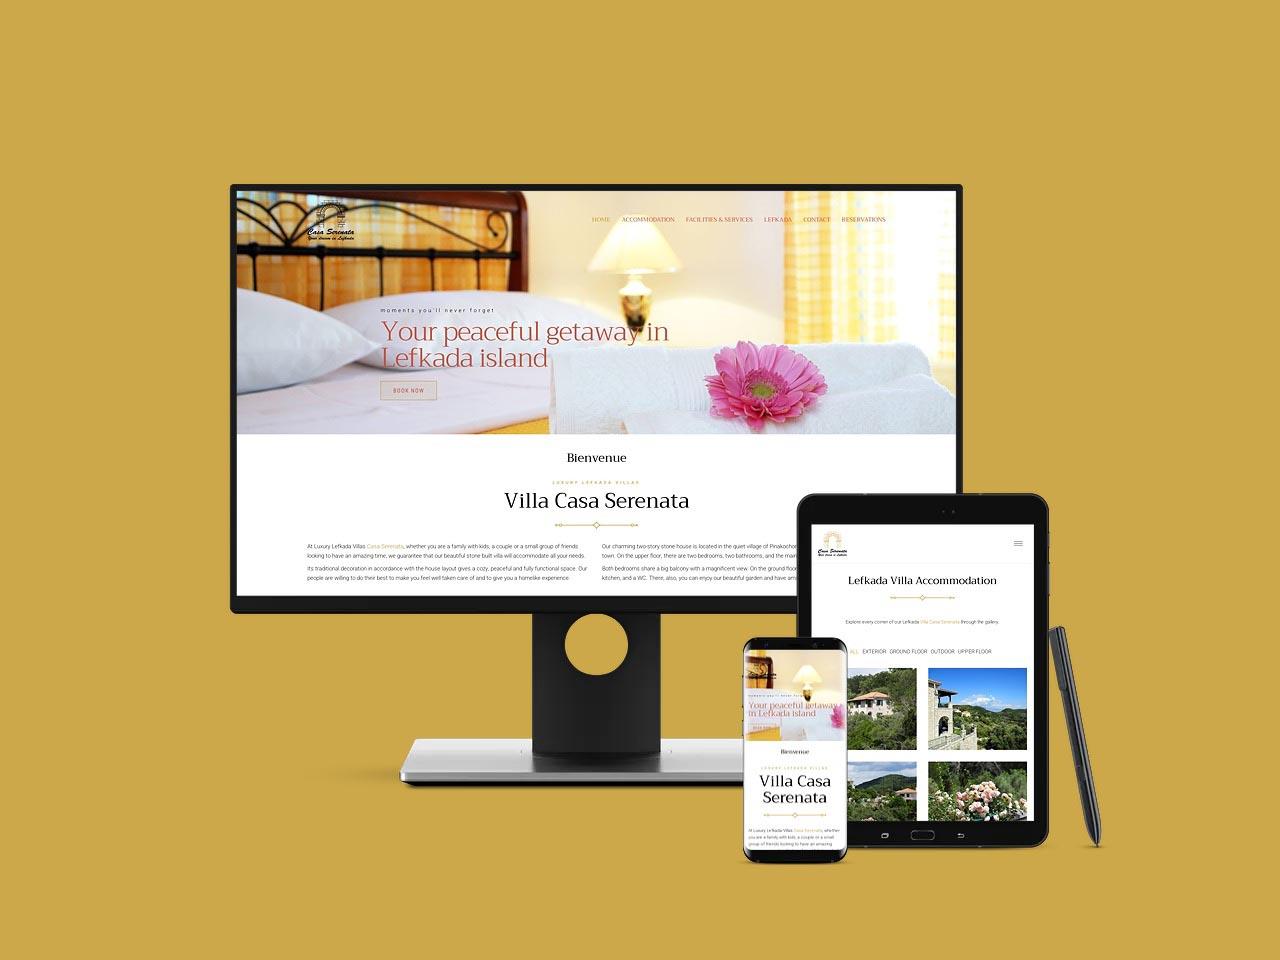 Villa Casa Serenata Lefkada Luxury Villas Λευκάδα Πολυτελή Βίλα με θέα